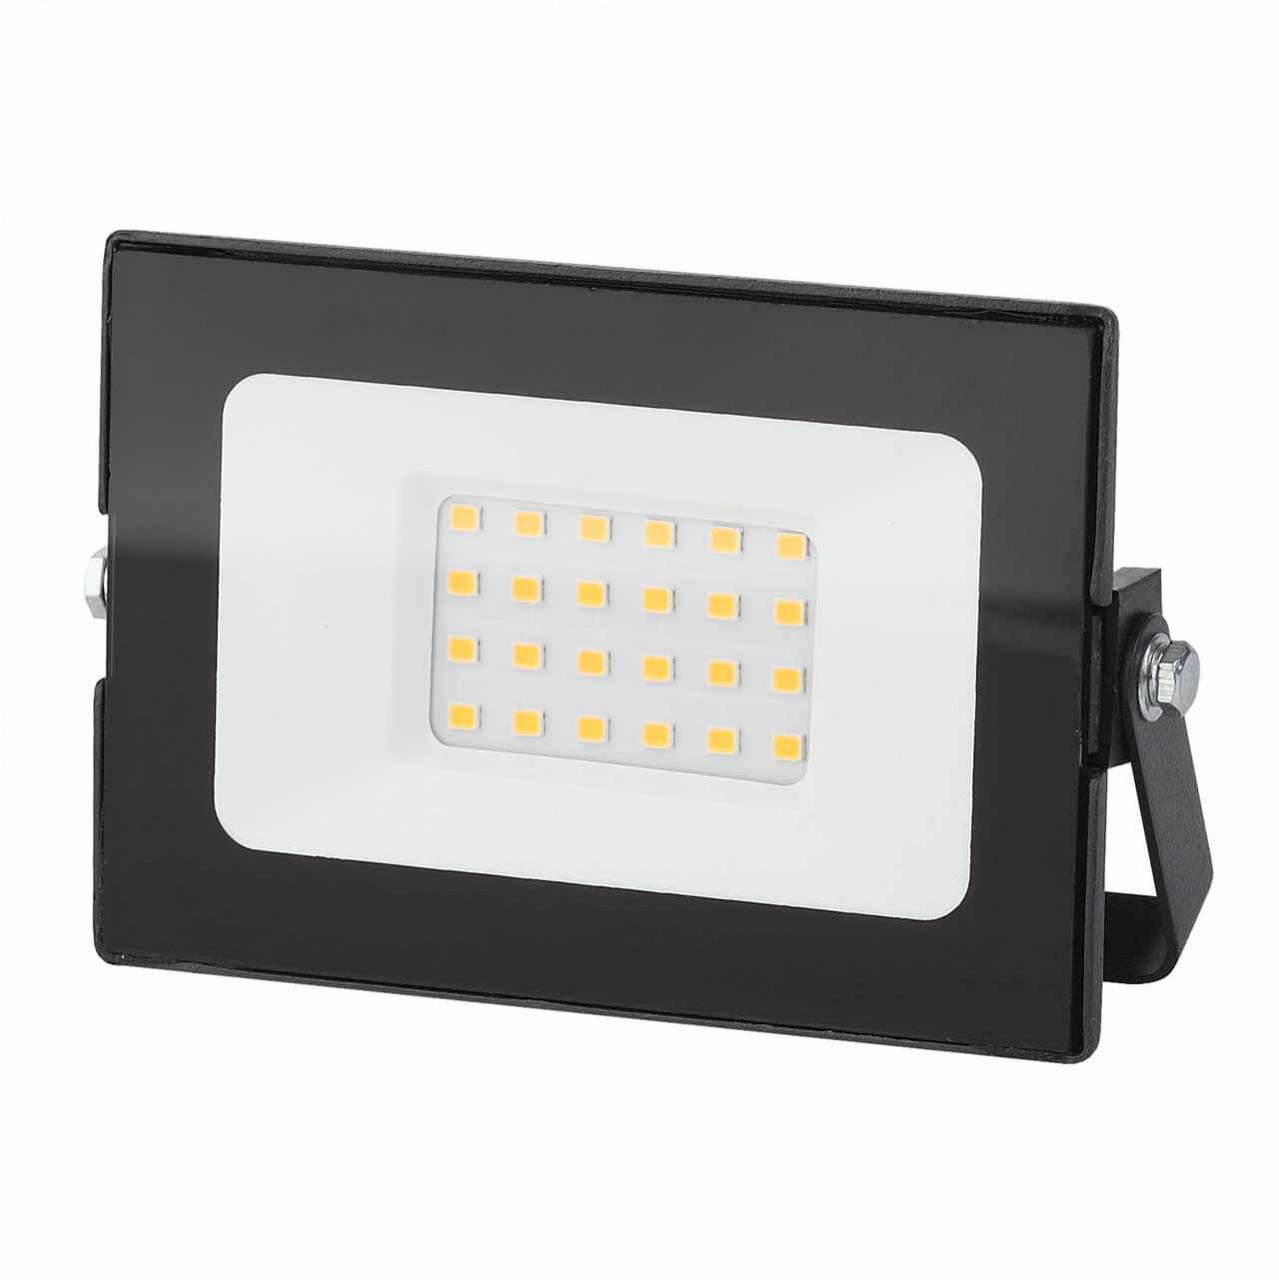 Прожектор ЭРА LPR-021-0-30K-020 PR-021